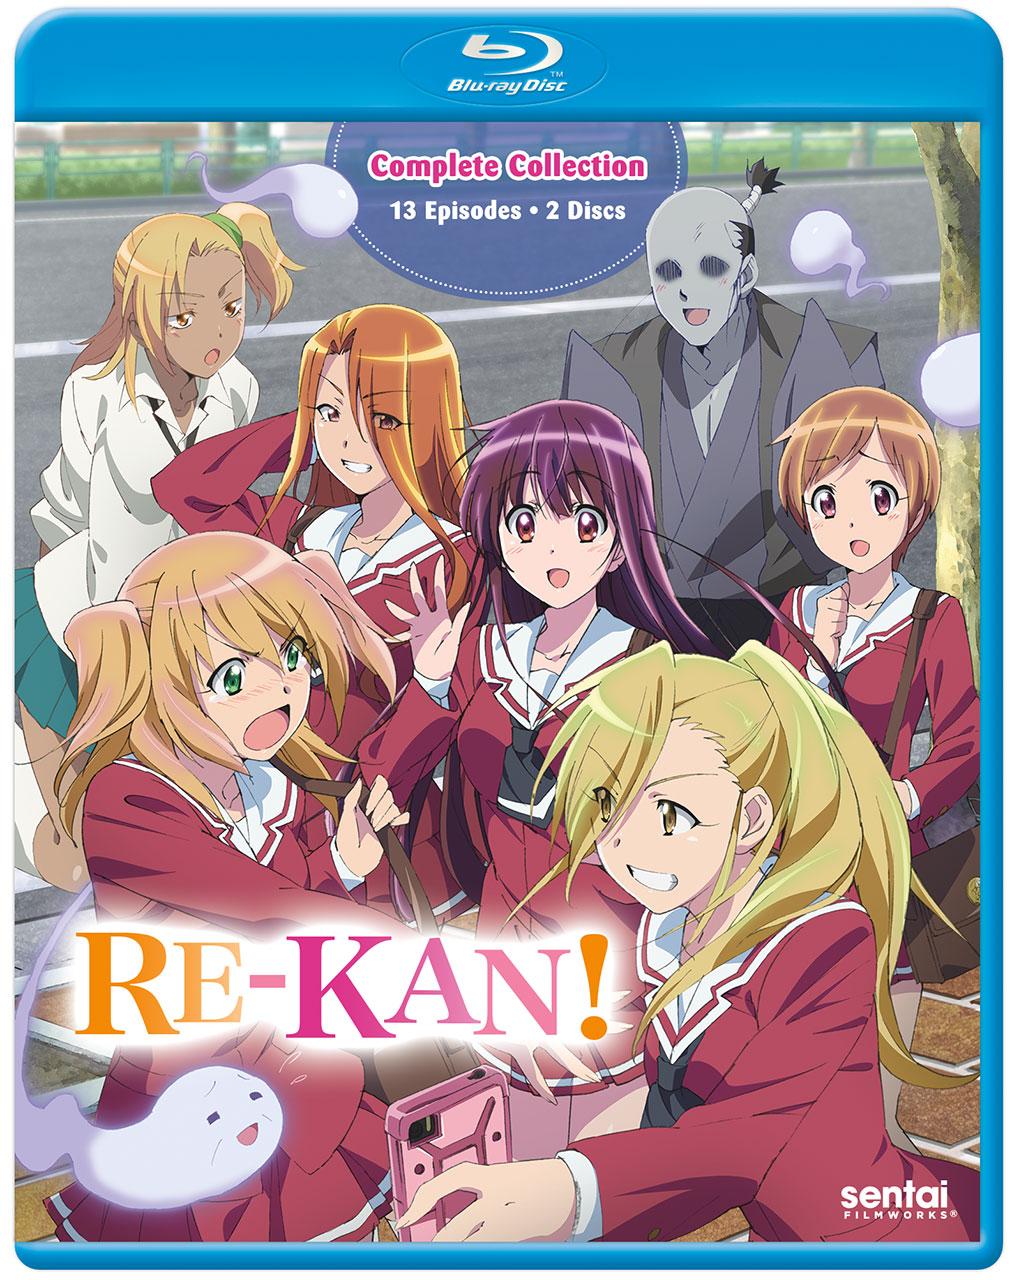 RE-KAN! Blu-ray 814131017499